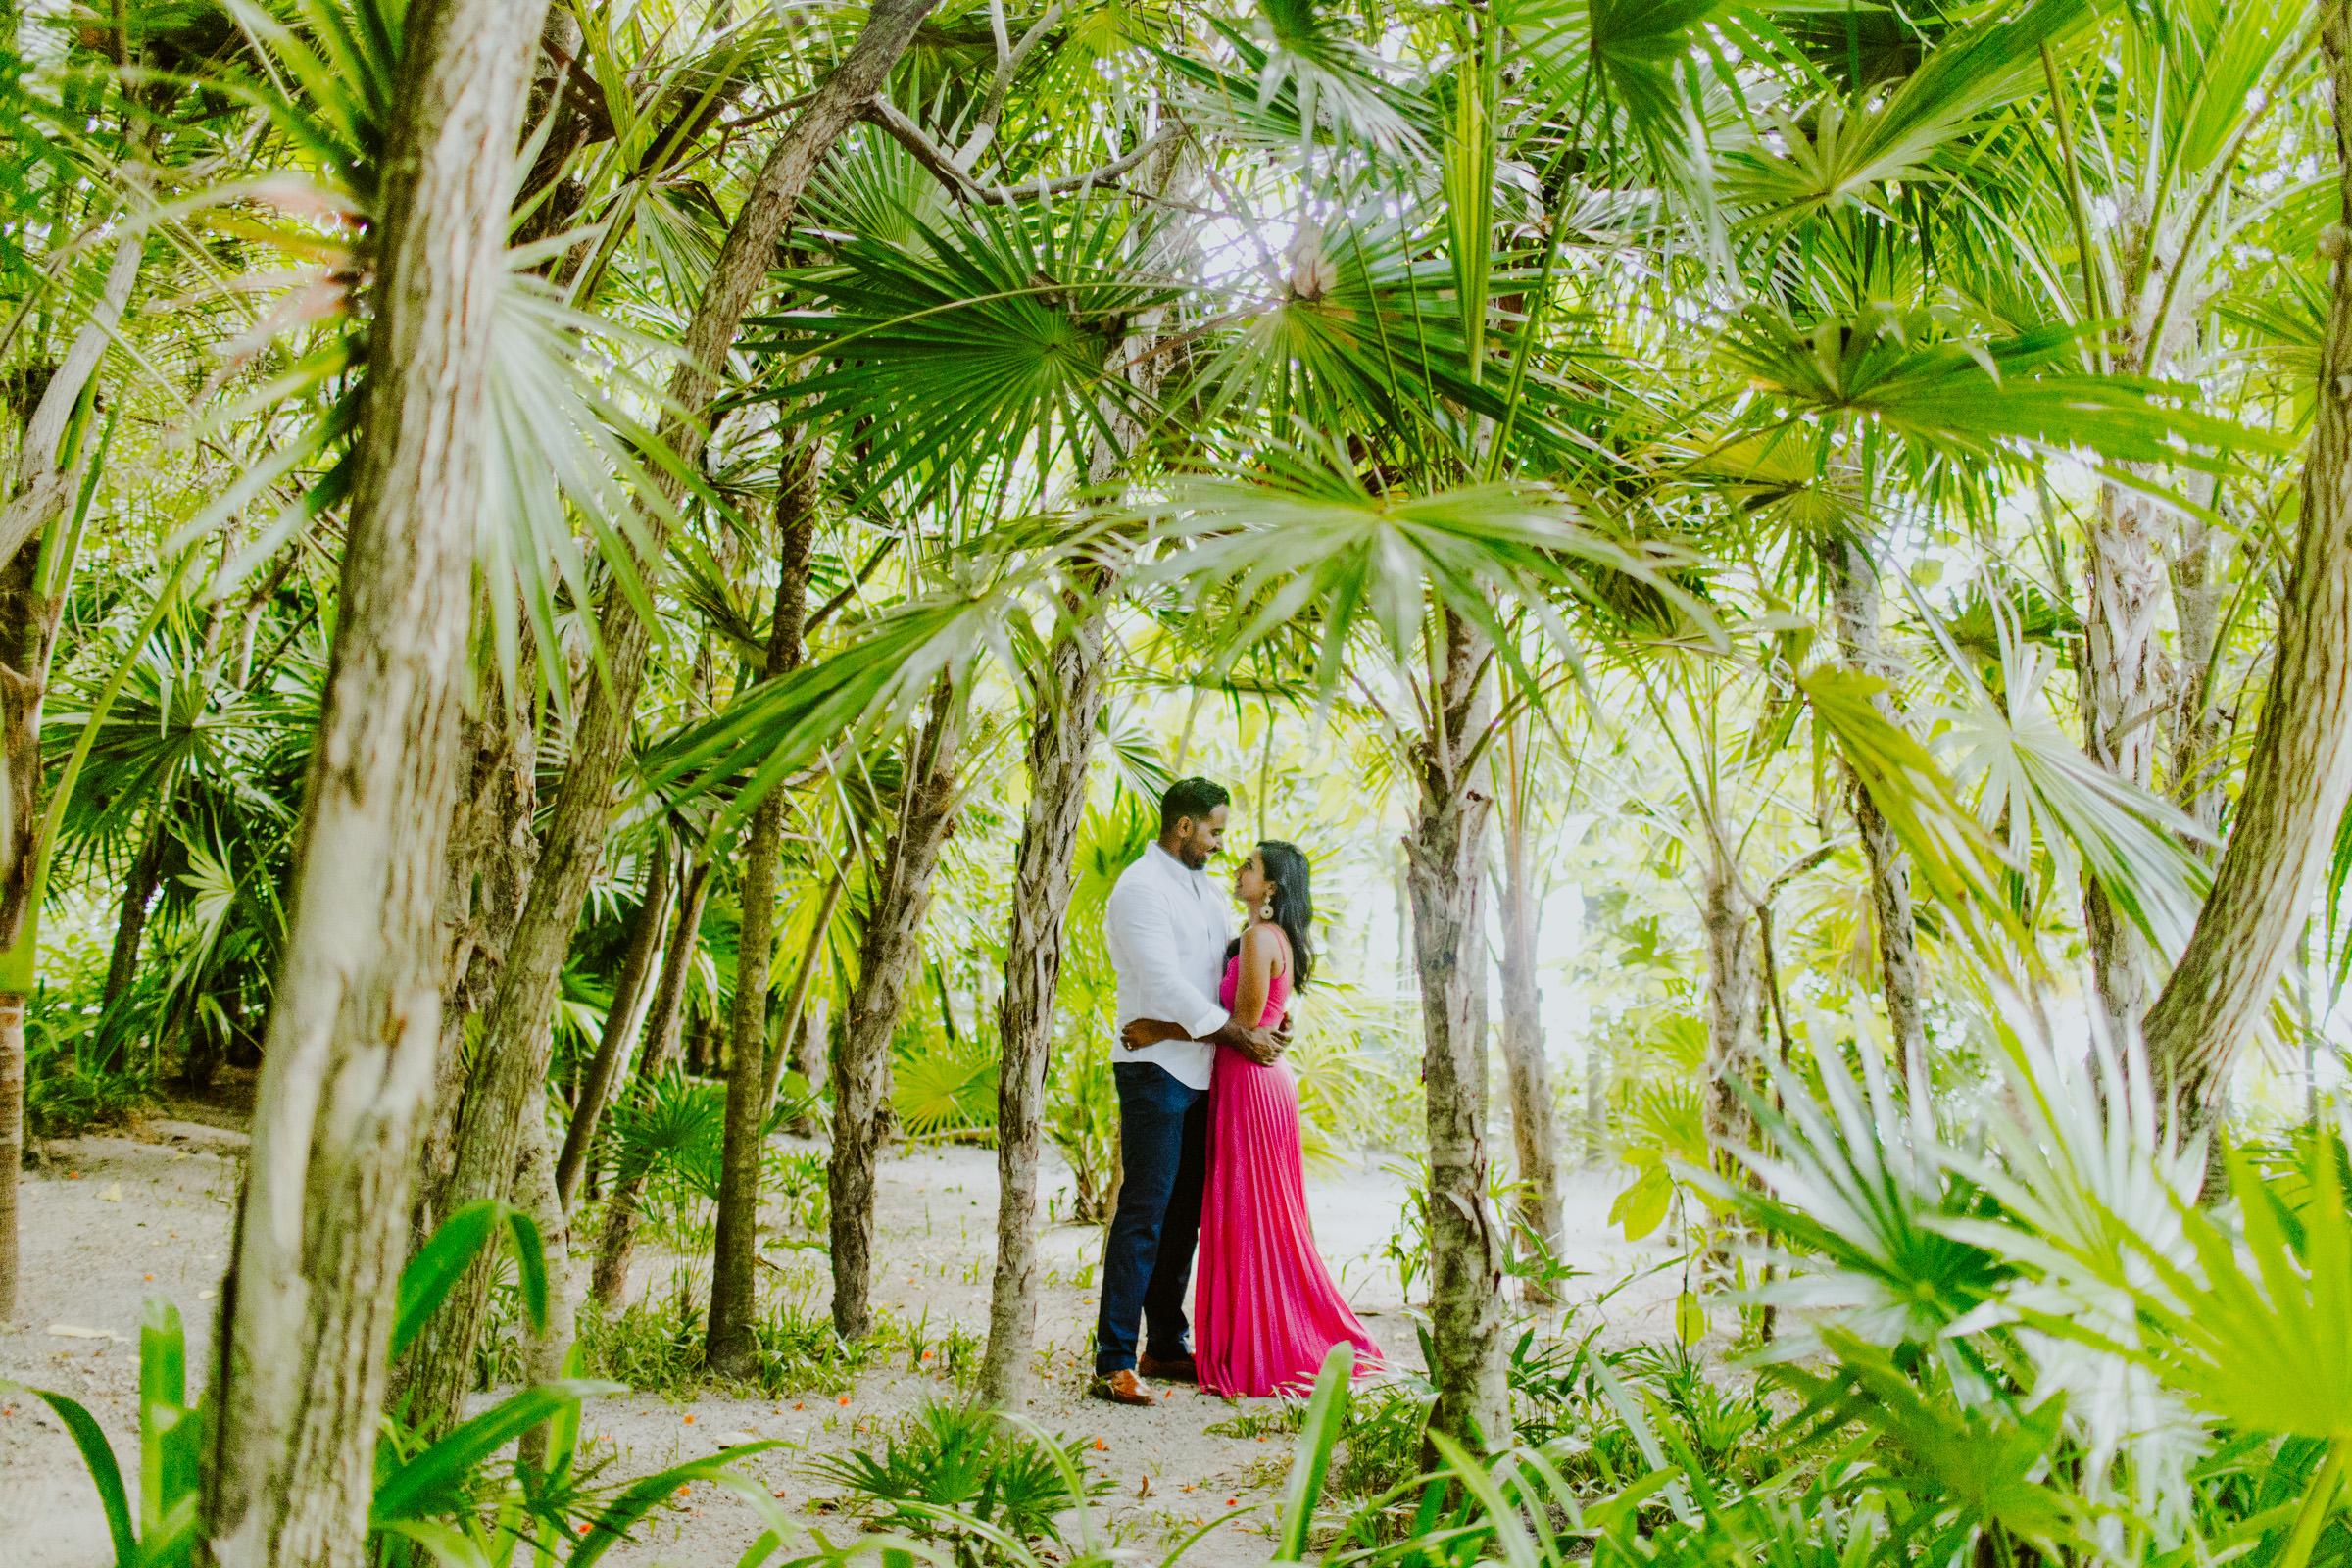 Engagement-Session-Nizuc-Resort-Spa-Indian-Wedding-Cancun-Mexico-Pierce--22.jpg